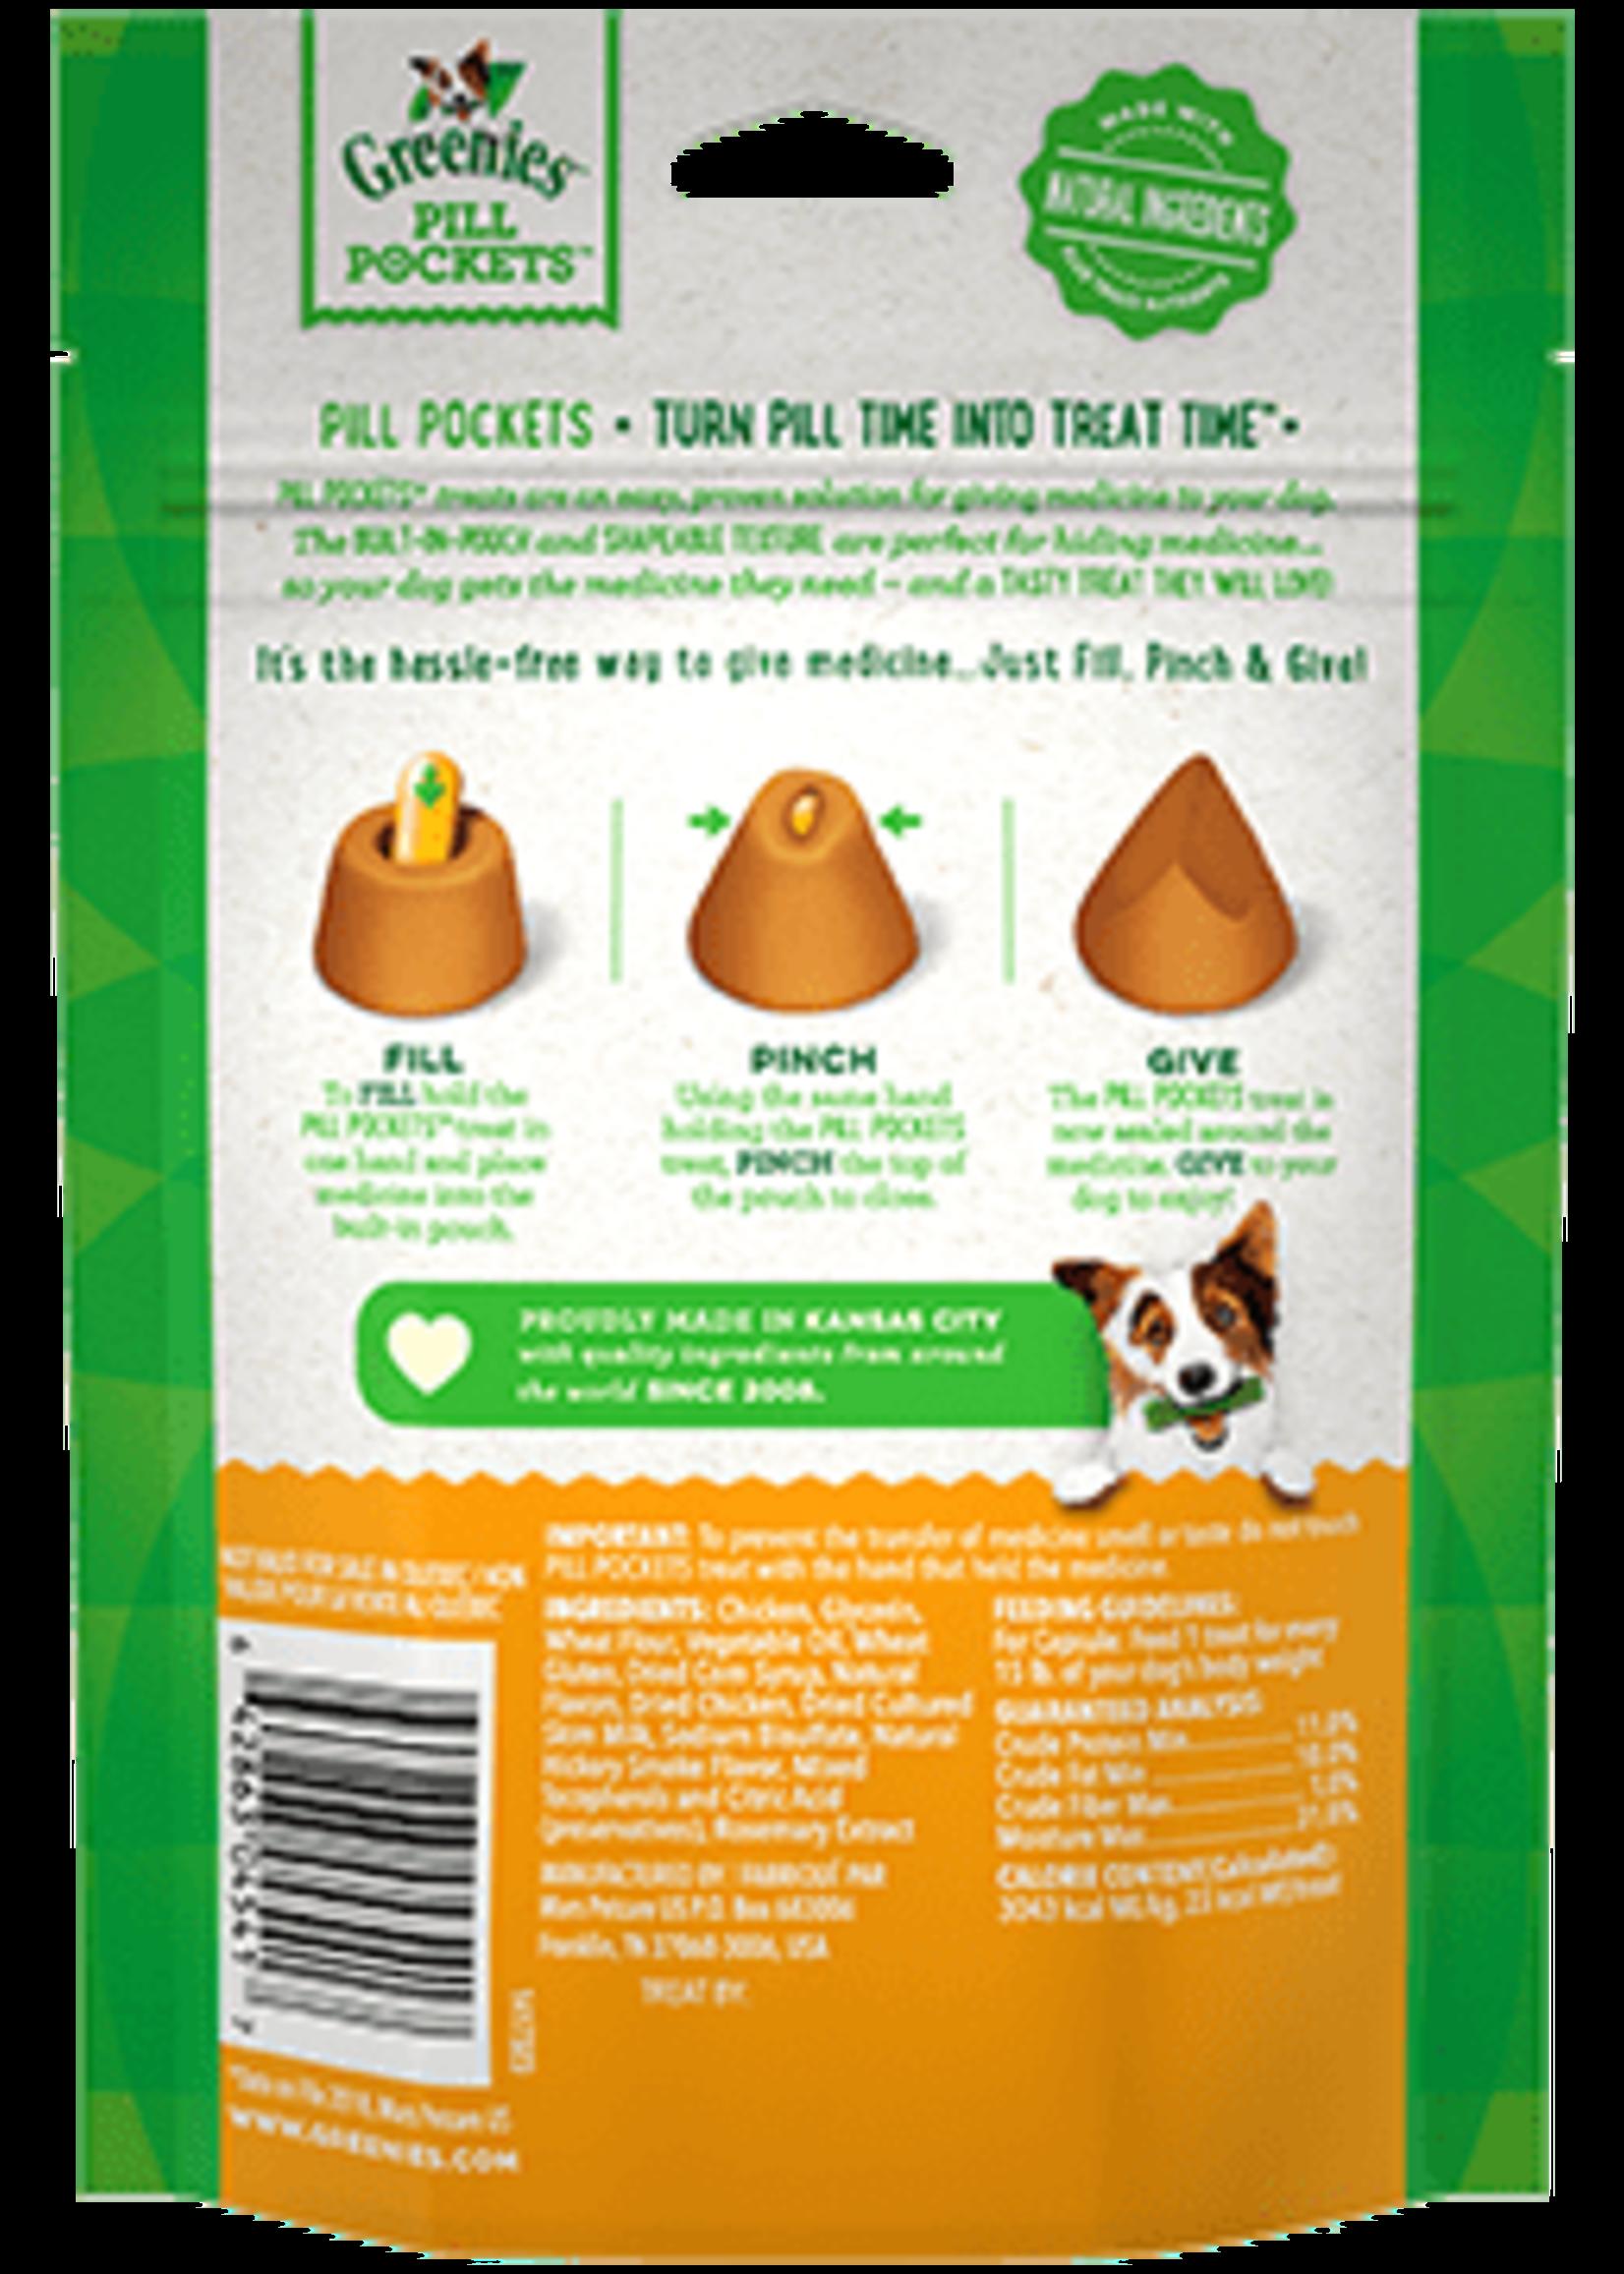 Greenies Greenies Pill Pockets Chicken 7.9OZ Capsule